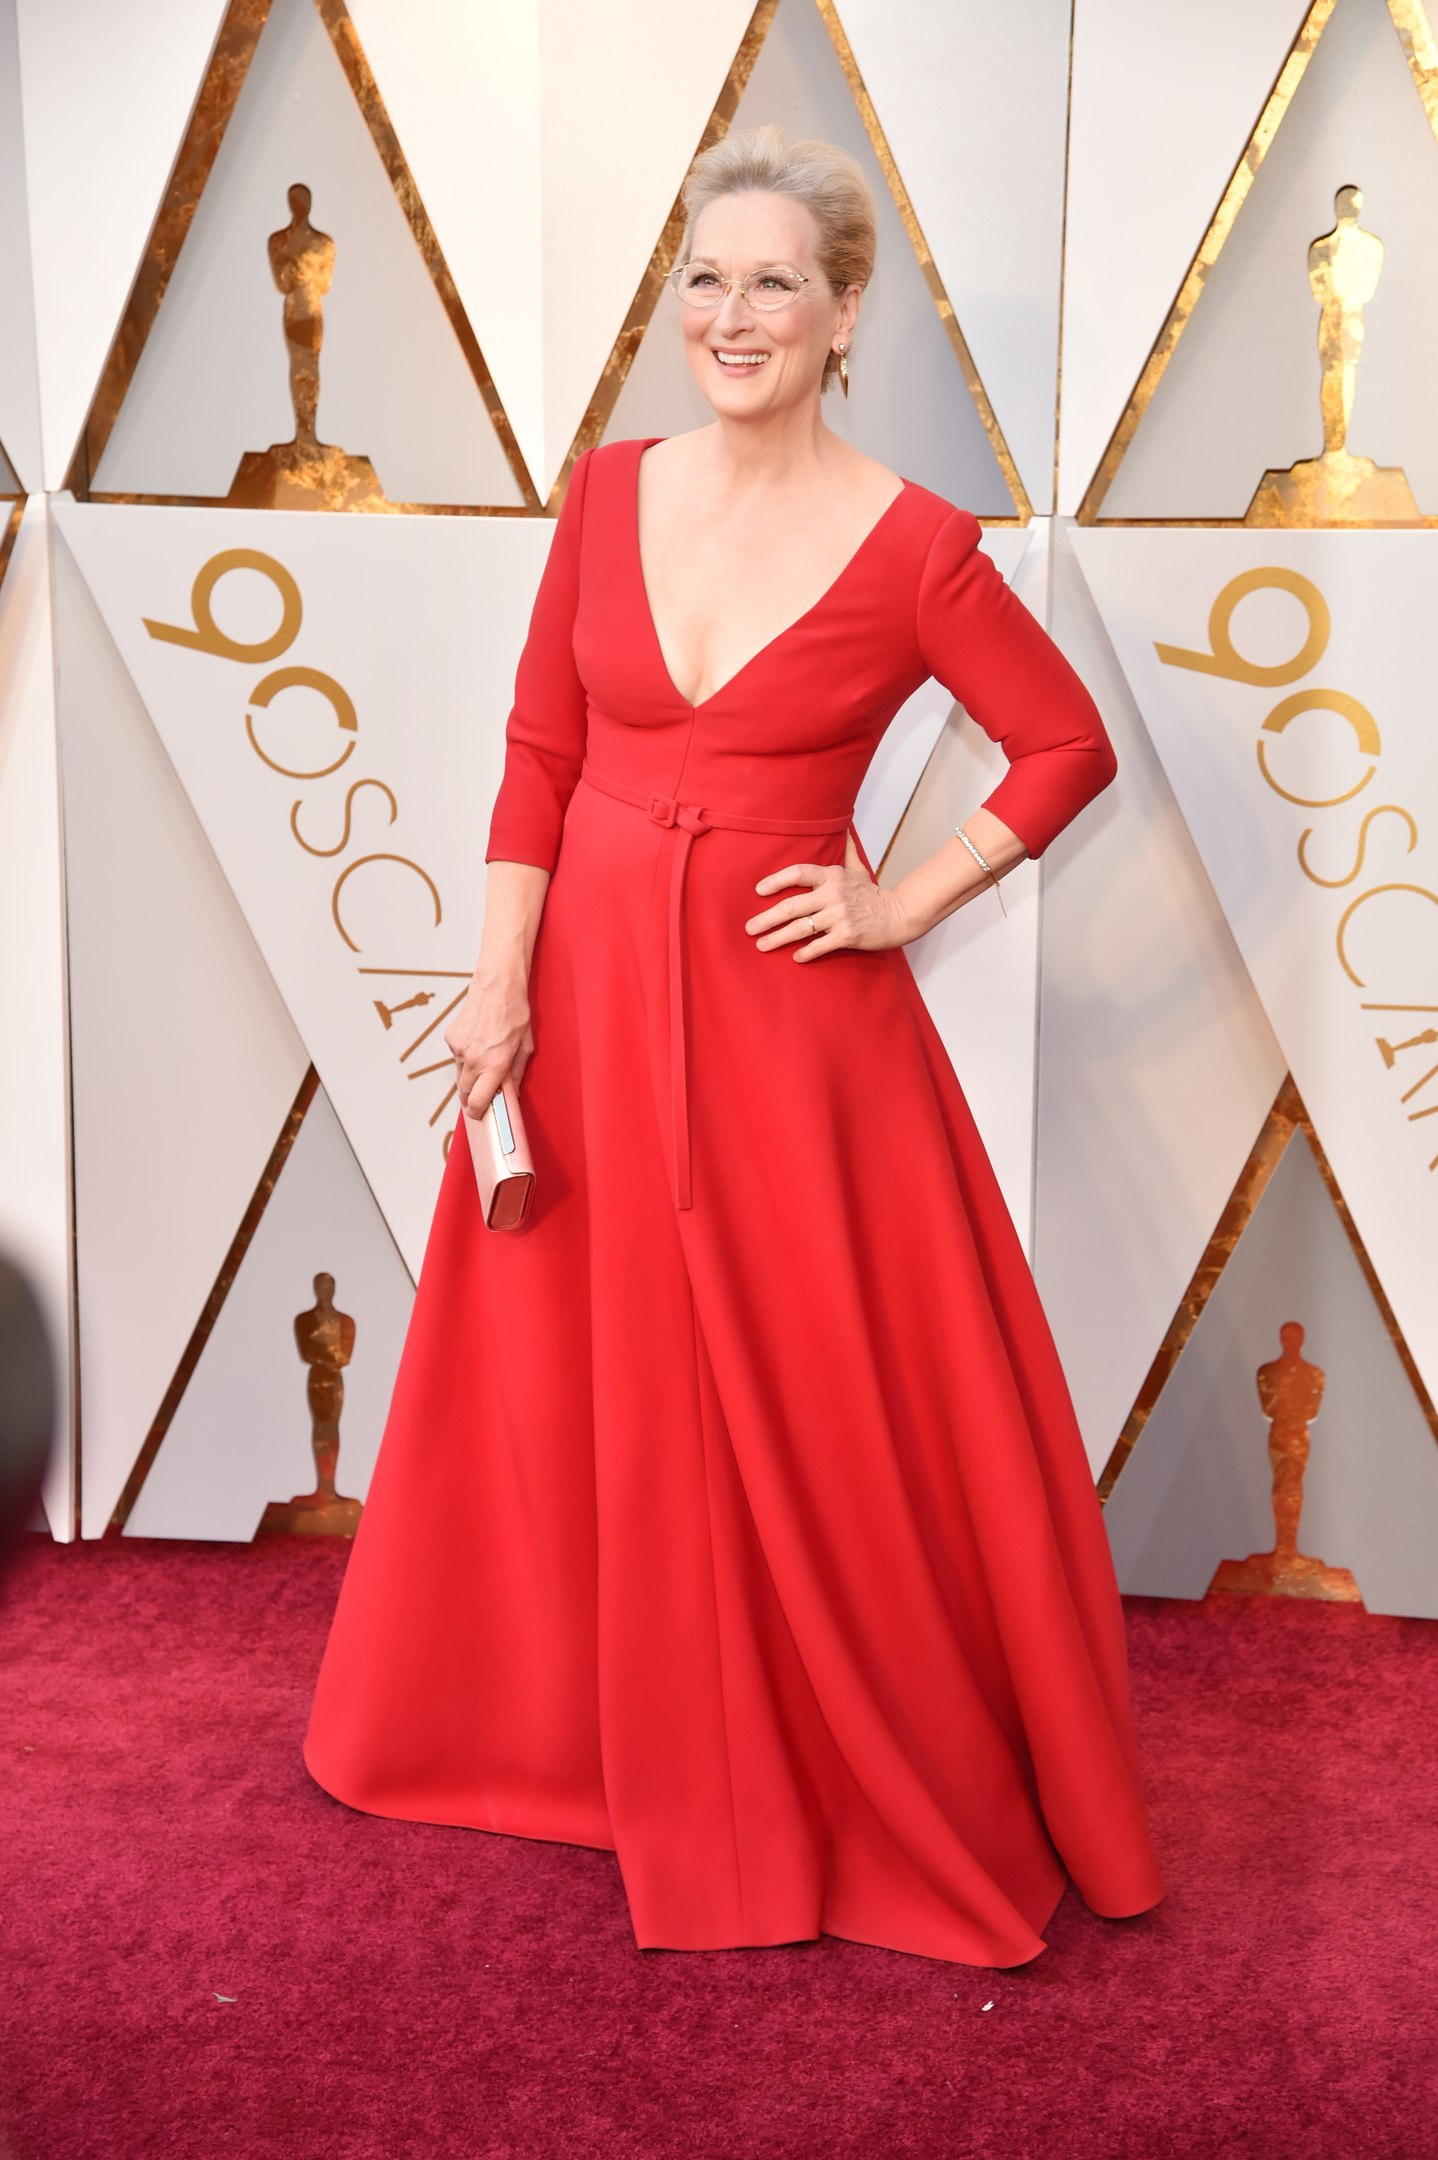 Oscars 2018 fashion photo gallery 100